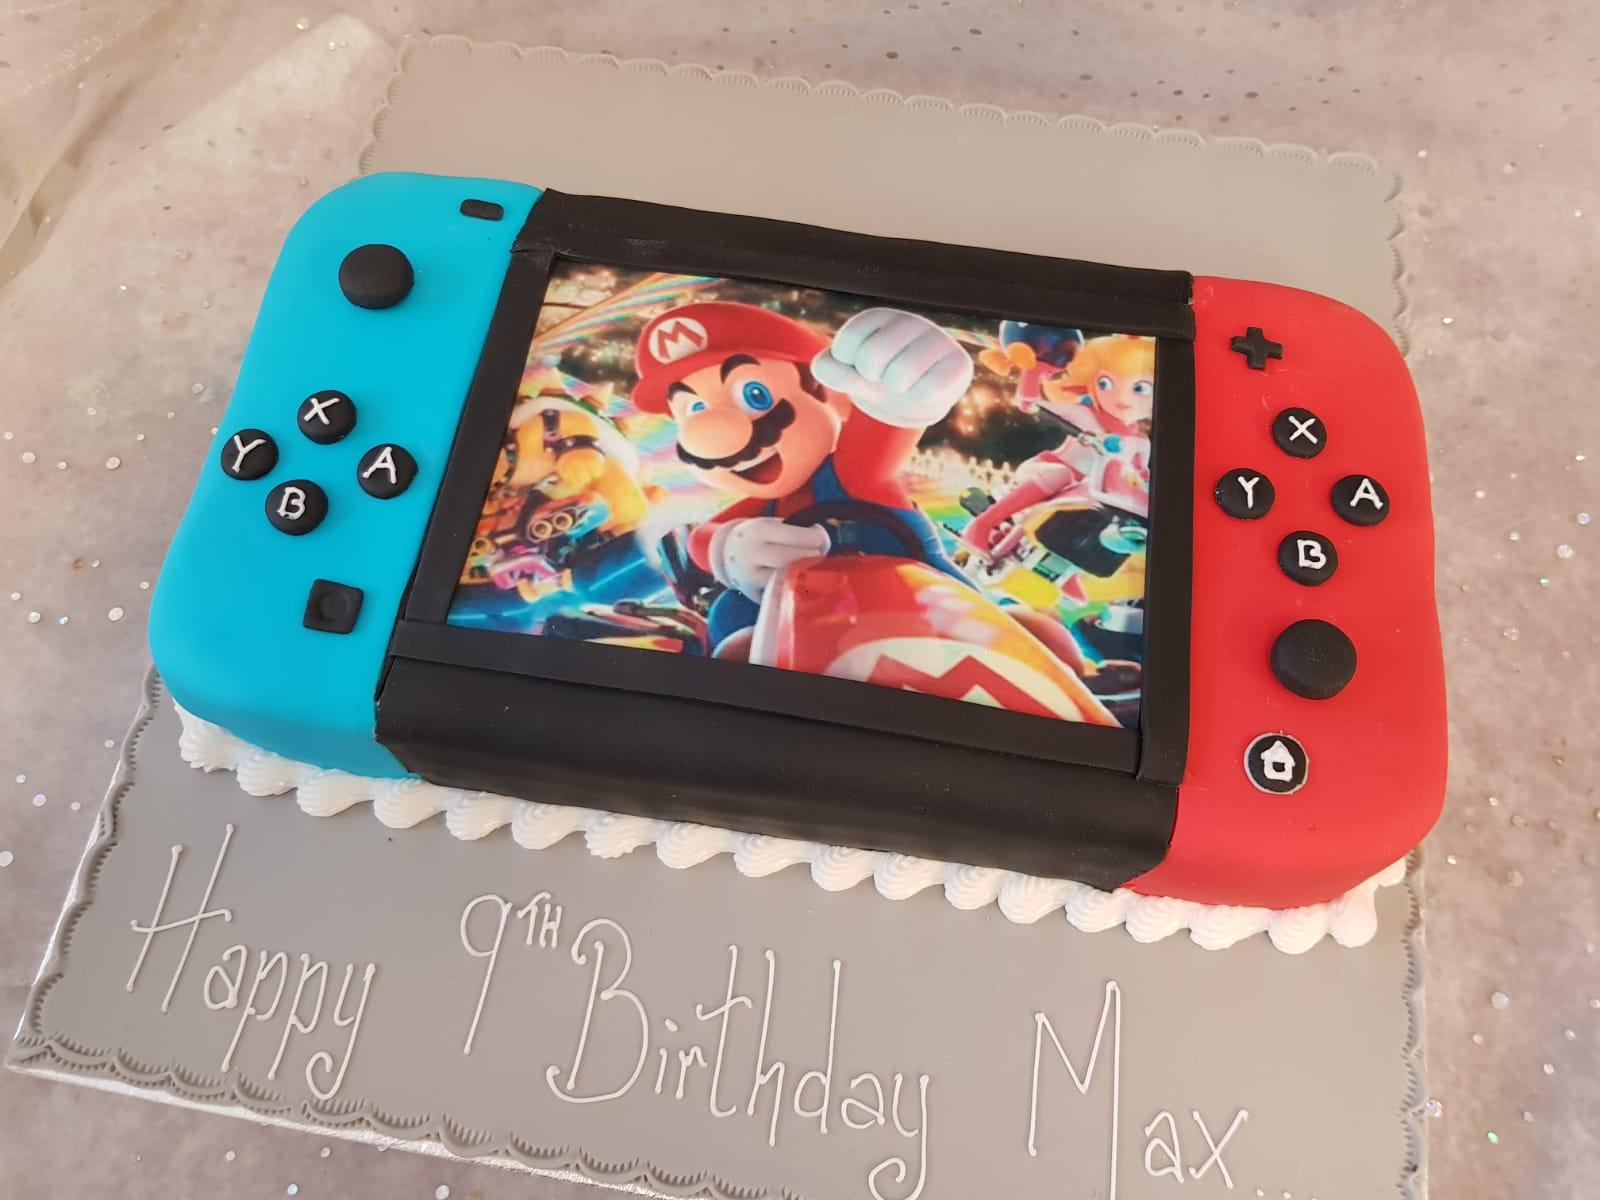 058 Nintendo Switch Mario Ravens Bakery Of Essex Ltd